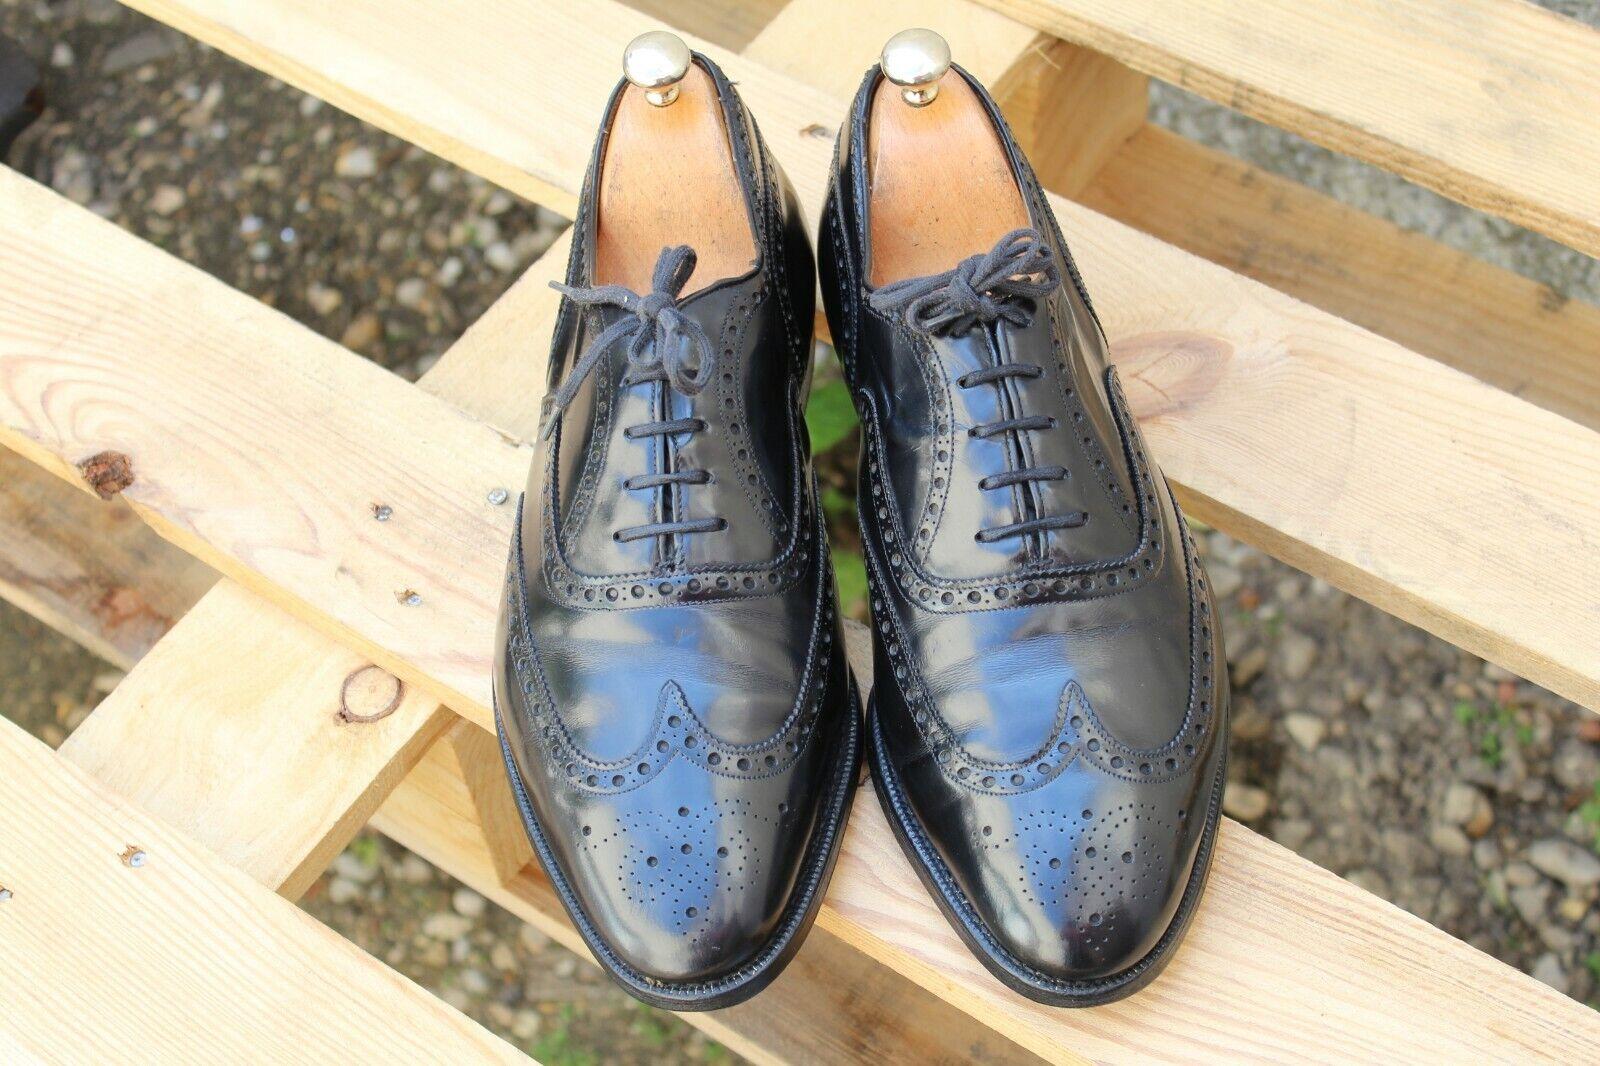 7c376f1b24f556 Chaussures Church's modèle Hickstead cuir glacé taille 90 G 43 en très bon  état